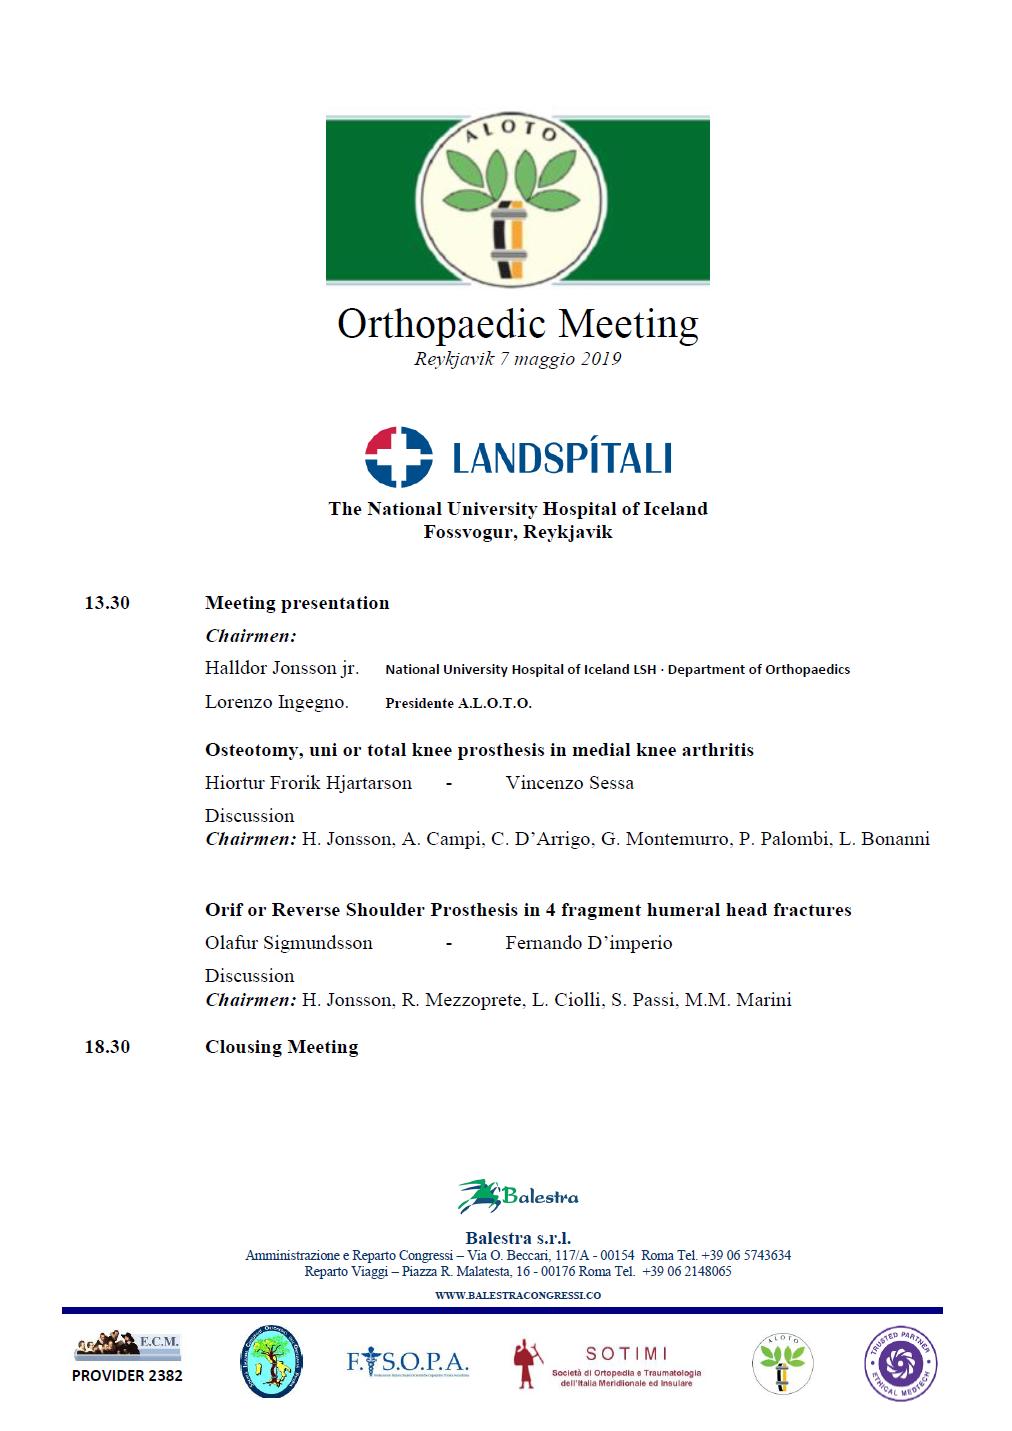 Orthopaedic Meeting - Reykjavik 7 maggio 2019